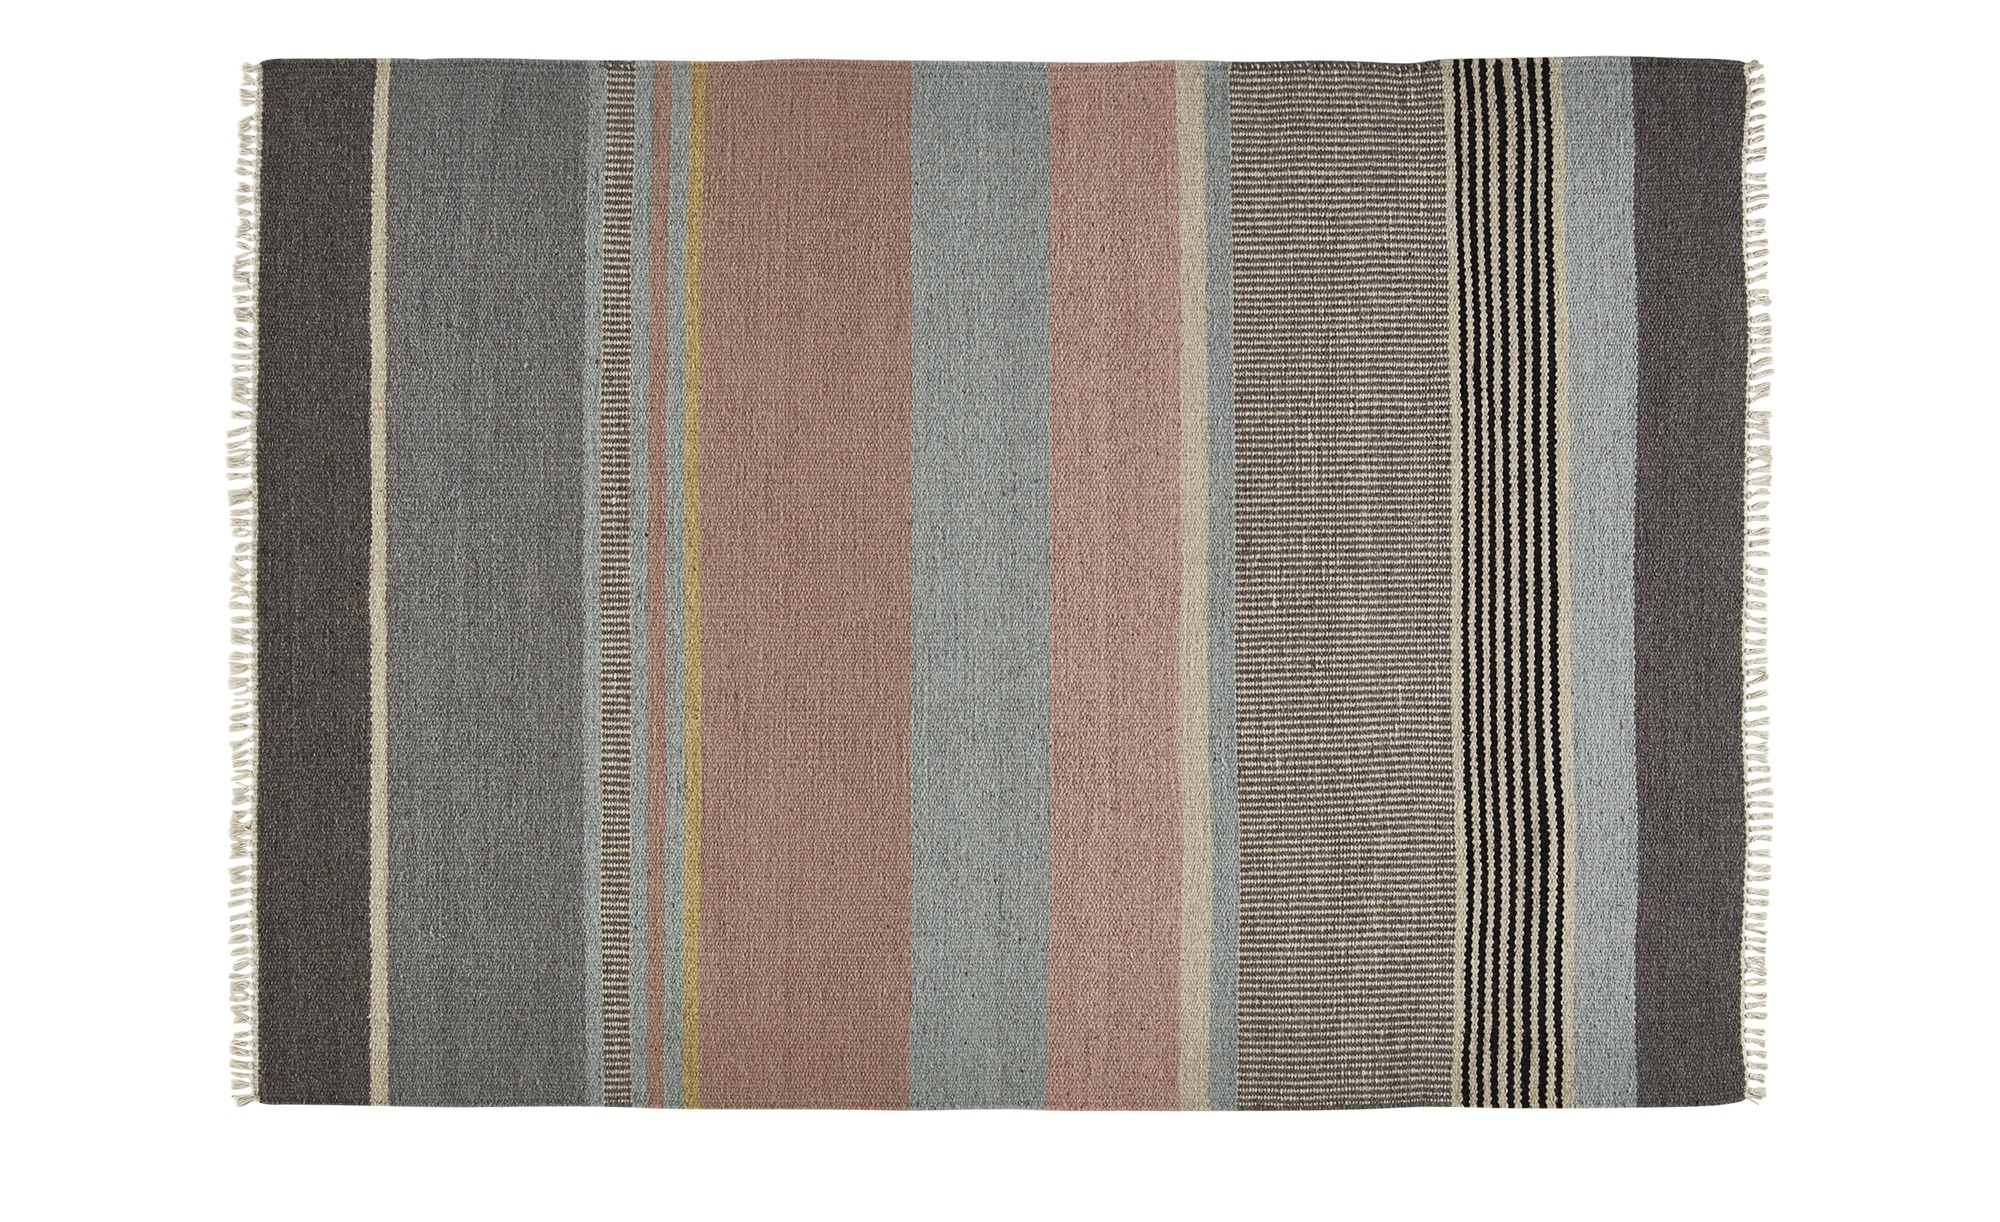 Gray & Jones Flachgewebeteppich ¦ mehrfarbig ¦ Maße (cm): B: 160 Teppiche > Auslegware - Höffner